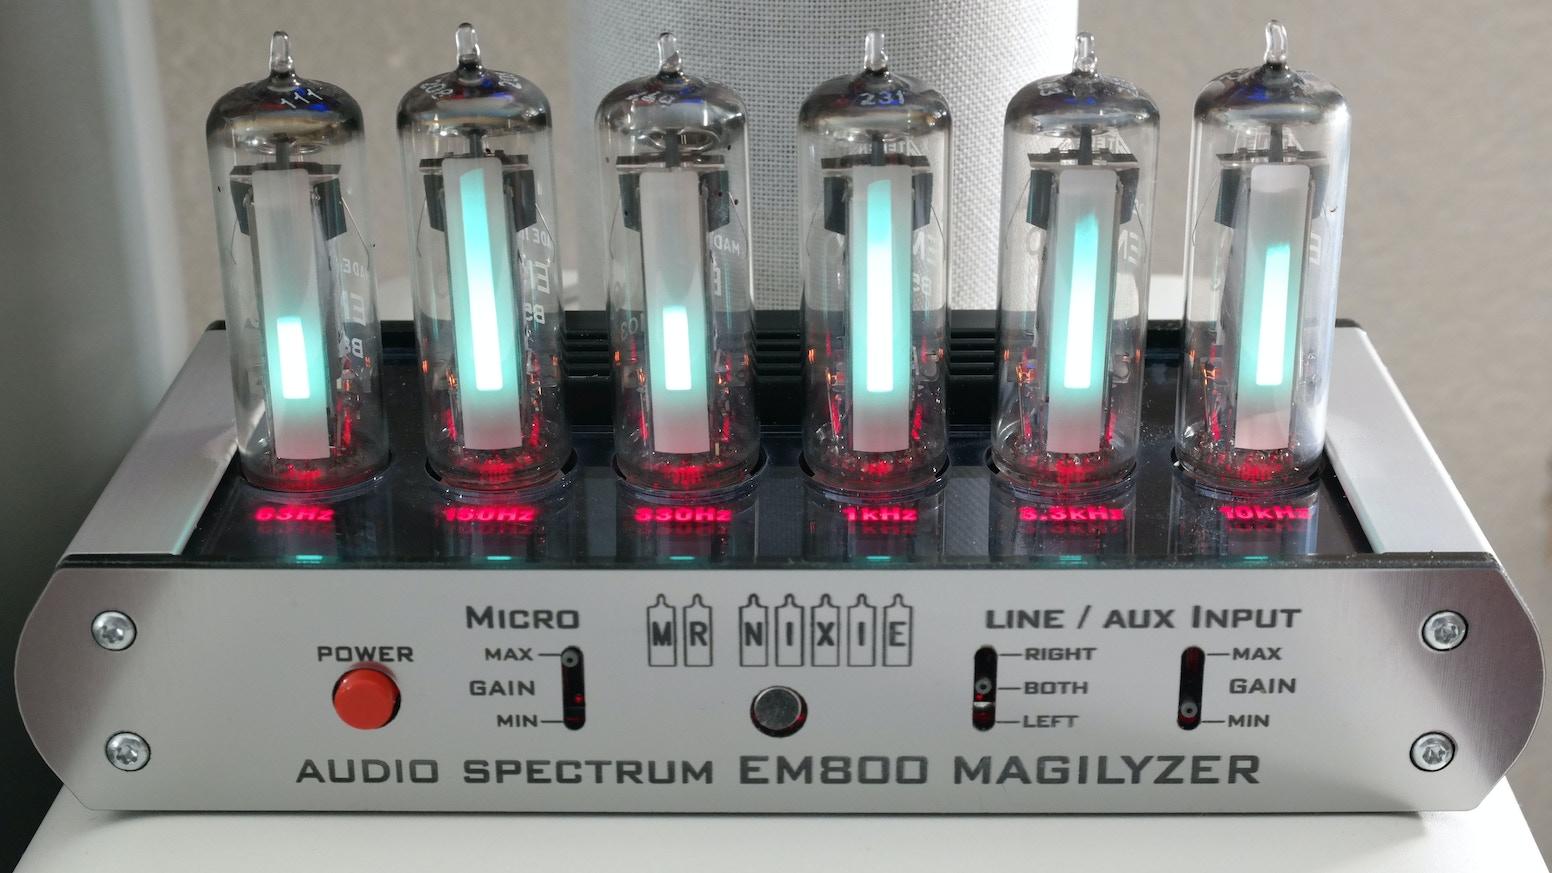 Audio Spectrum Analyzer With Em800 Tubes Called Magilyzer By Simple Vu Meter Analog Circuit 6 Band X New Old Stock German Telefunken Magic